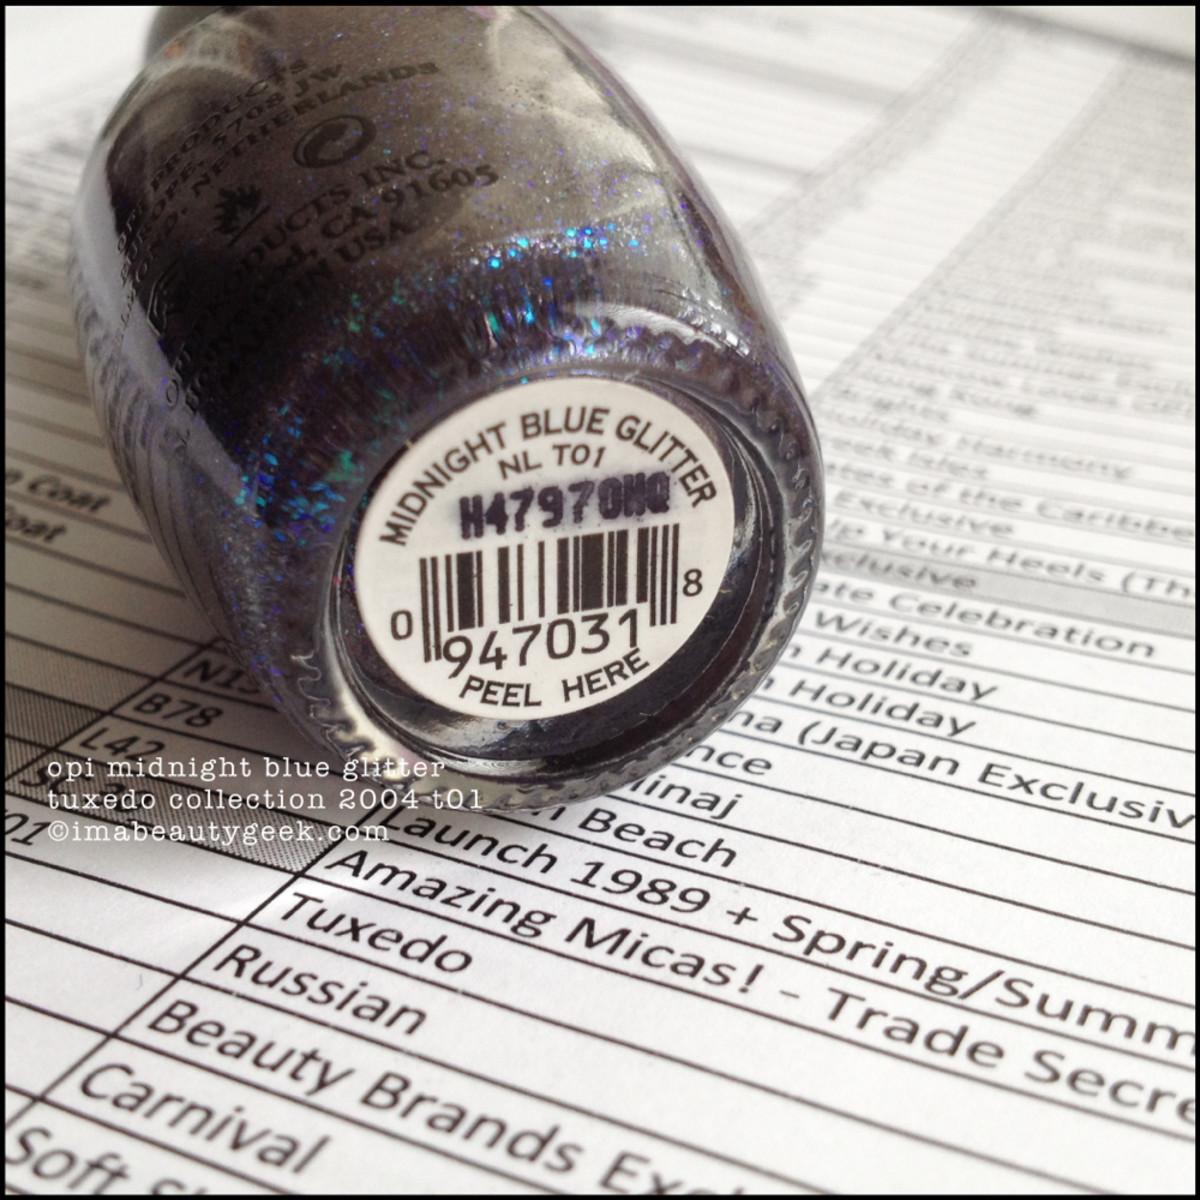 OPI Midnight Blue Glitter Black Label OPI Tuxedo Collection 2004 Beautygeeks